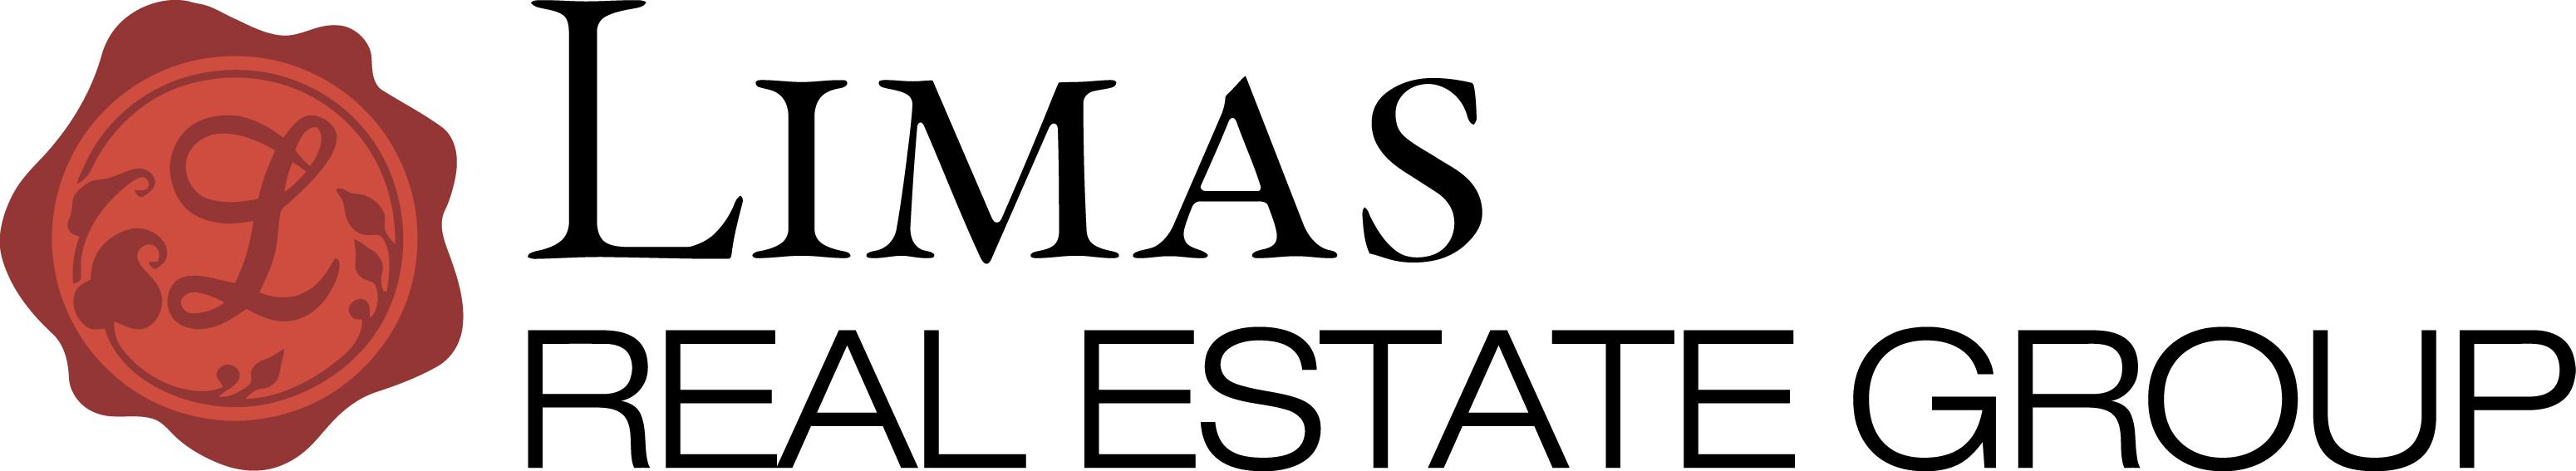 Limas Real Estate Group logo